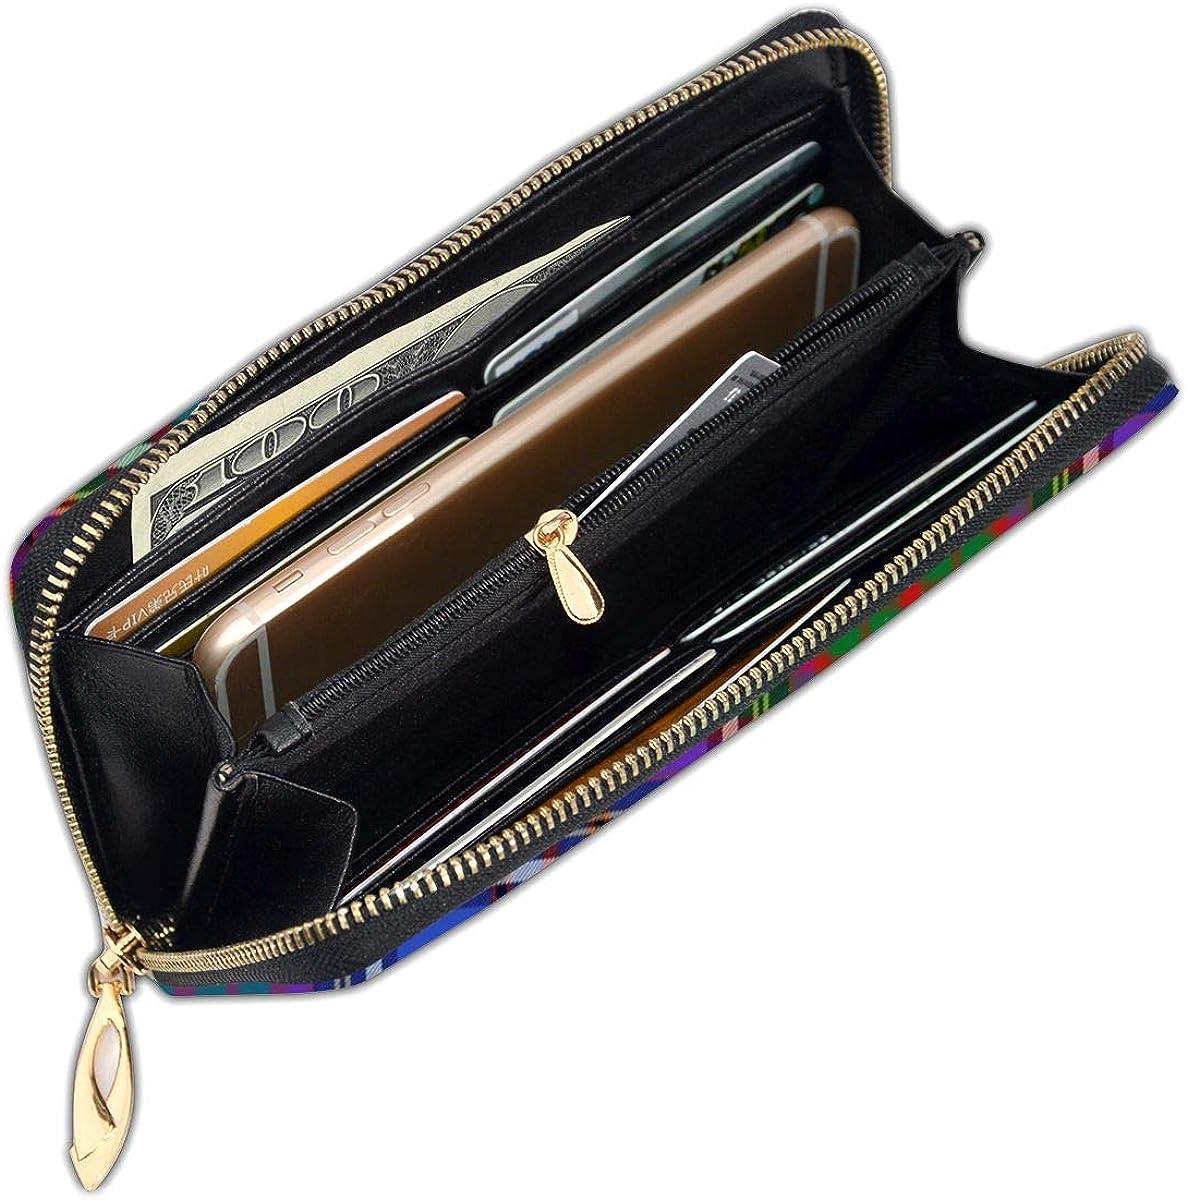 Anderson Tartan Wallets For Men Women Long Leather Checkbook Card Holder Purse Zipper Buckle Elegant Clutch Ladies Coin Purse